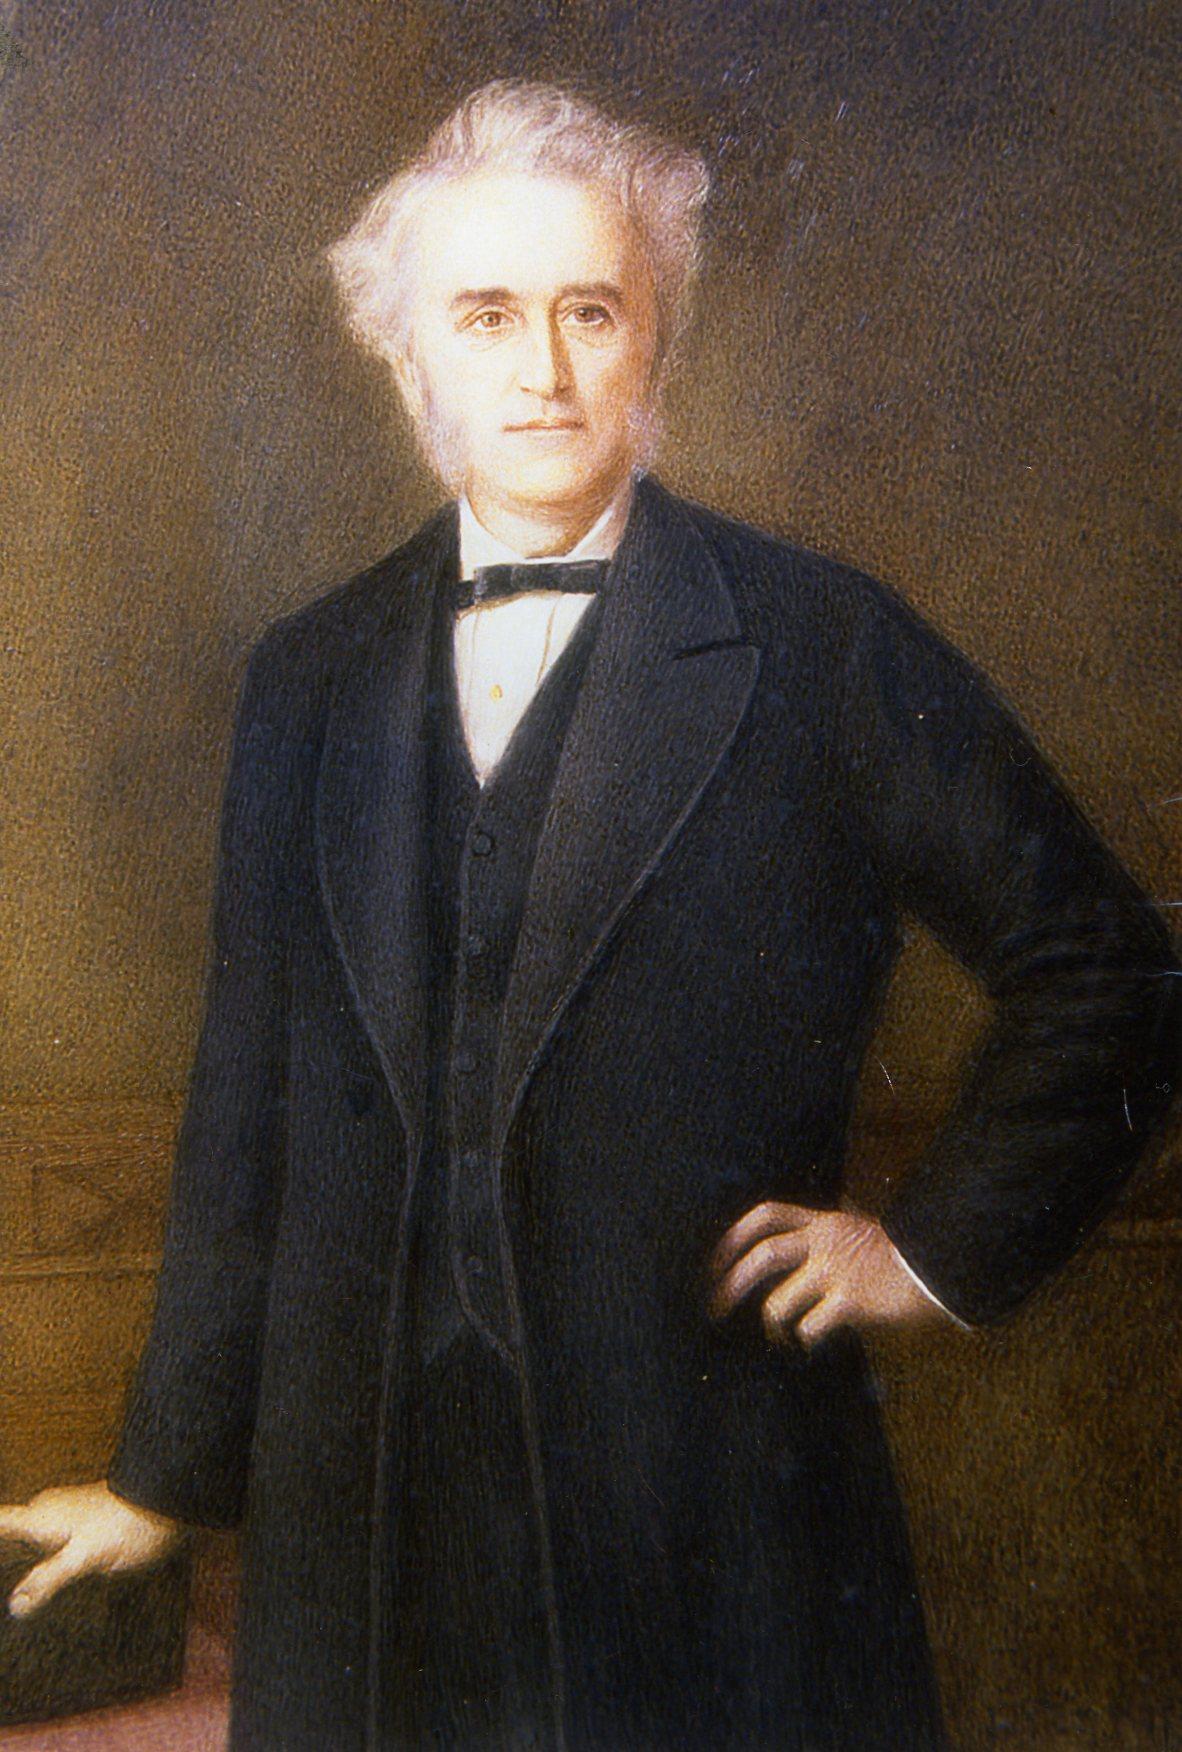 Copy of Family John Langdon Down